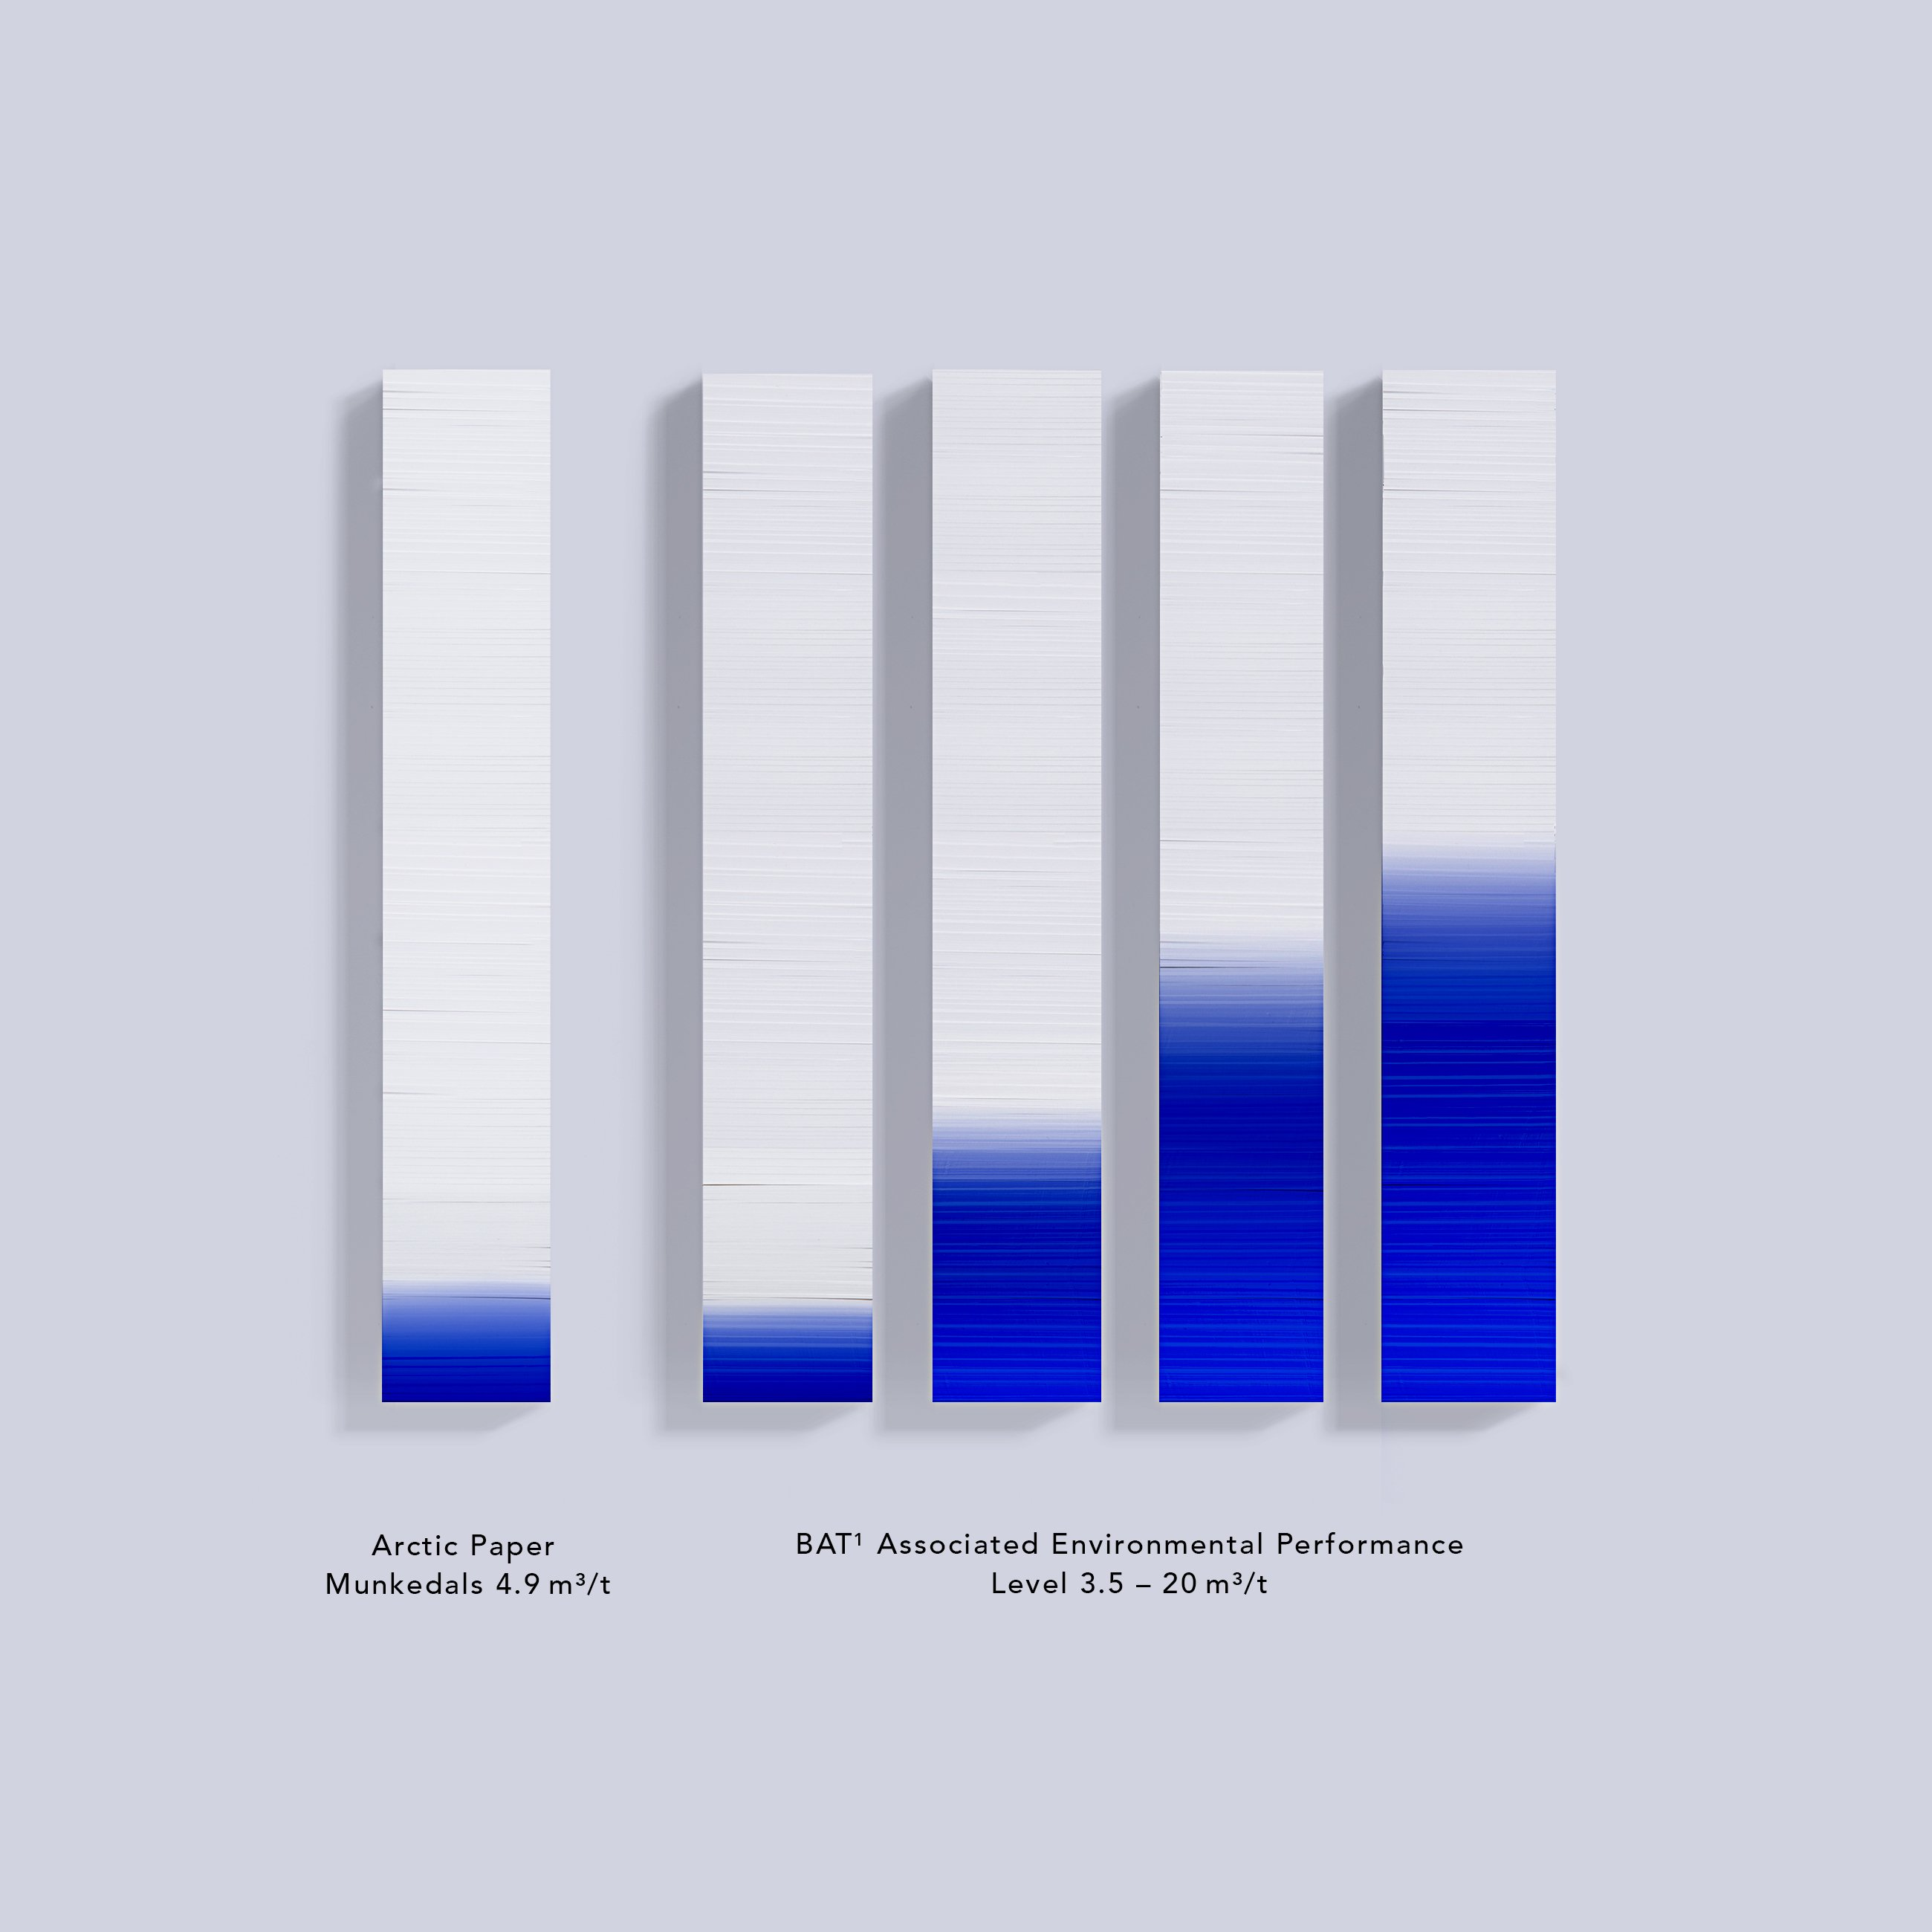 Arctic-Paper-Munkedals-Water-usage-2020_v2.jpg